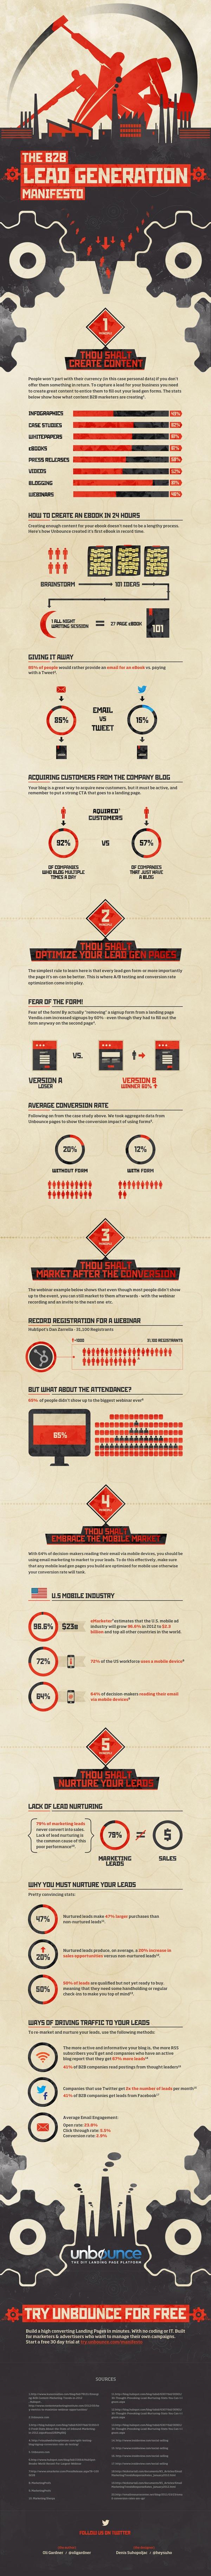 B2B Lead Generation Tactics-Infographic